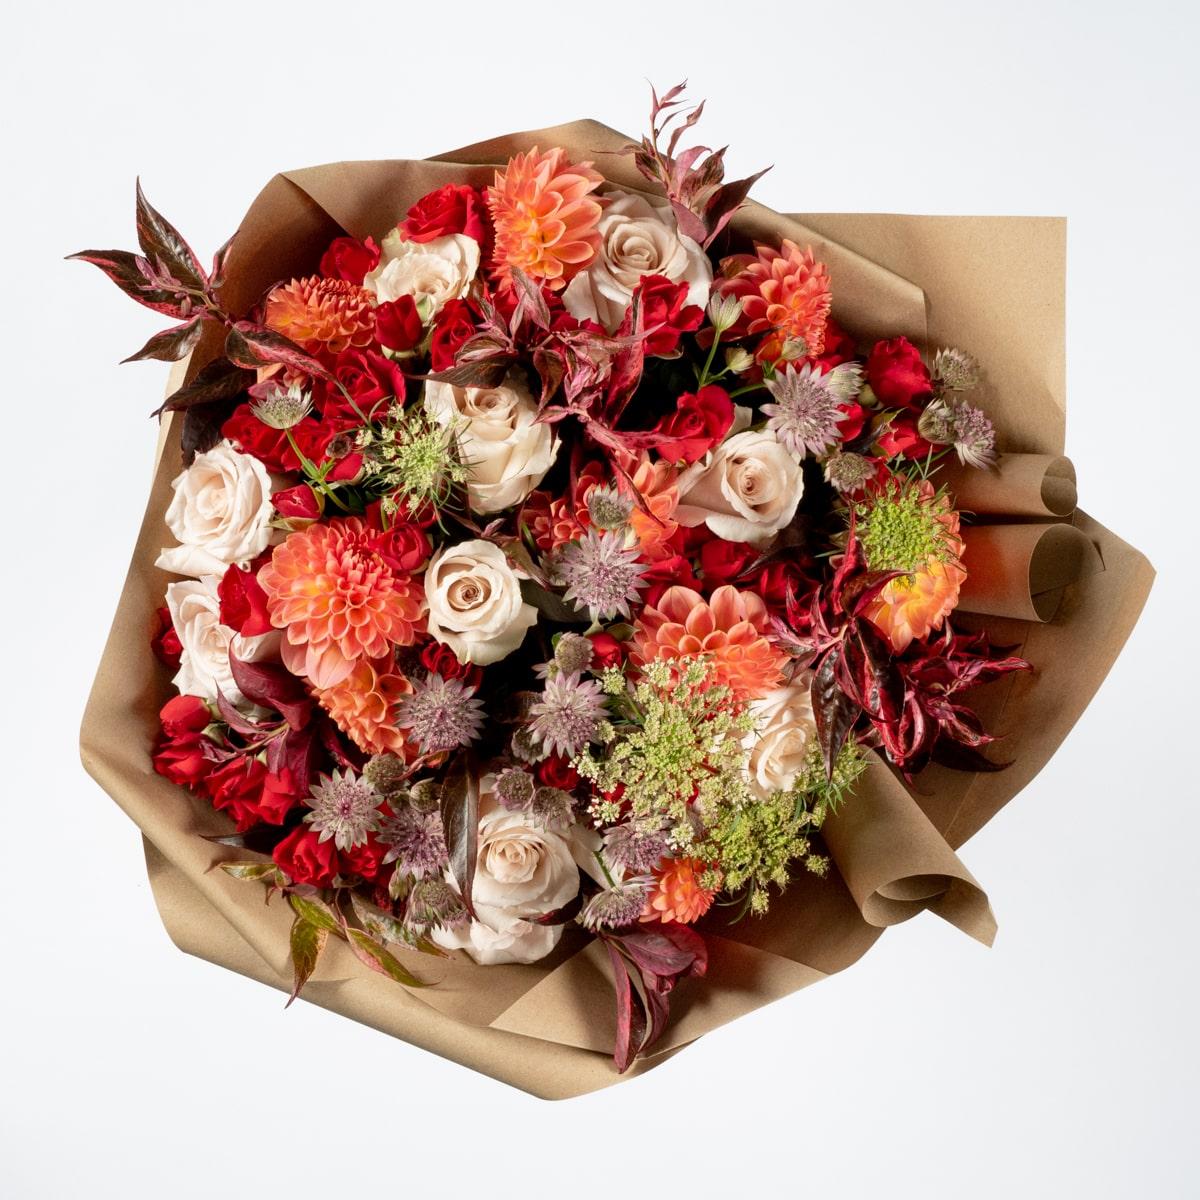 Bloom Flower Delivery | Belvedere Bouquet